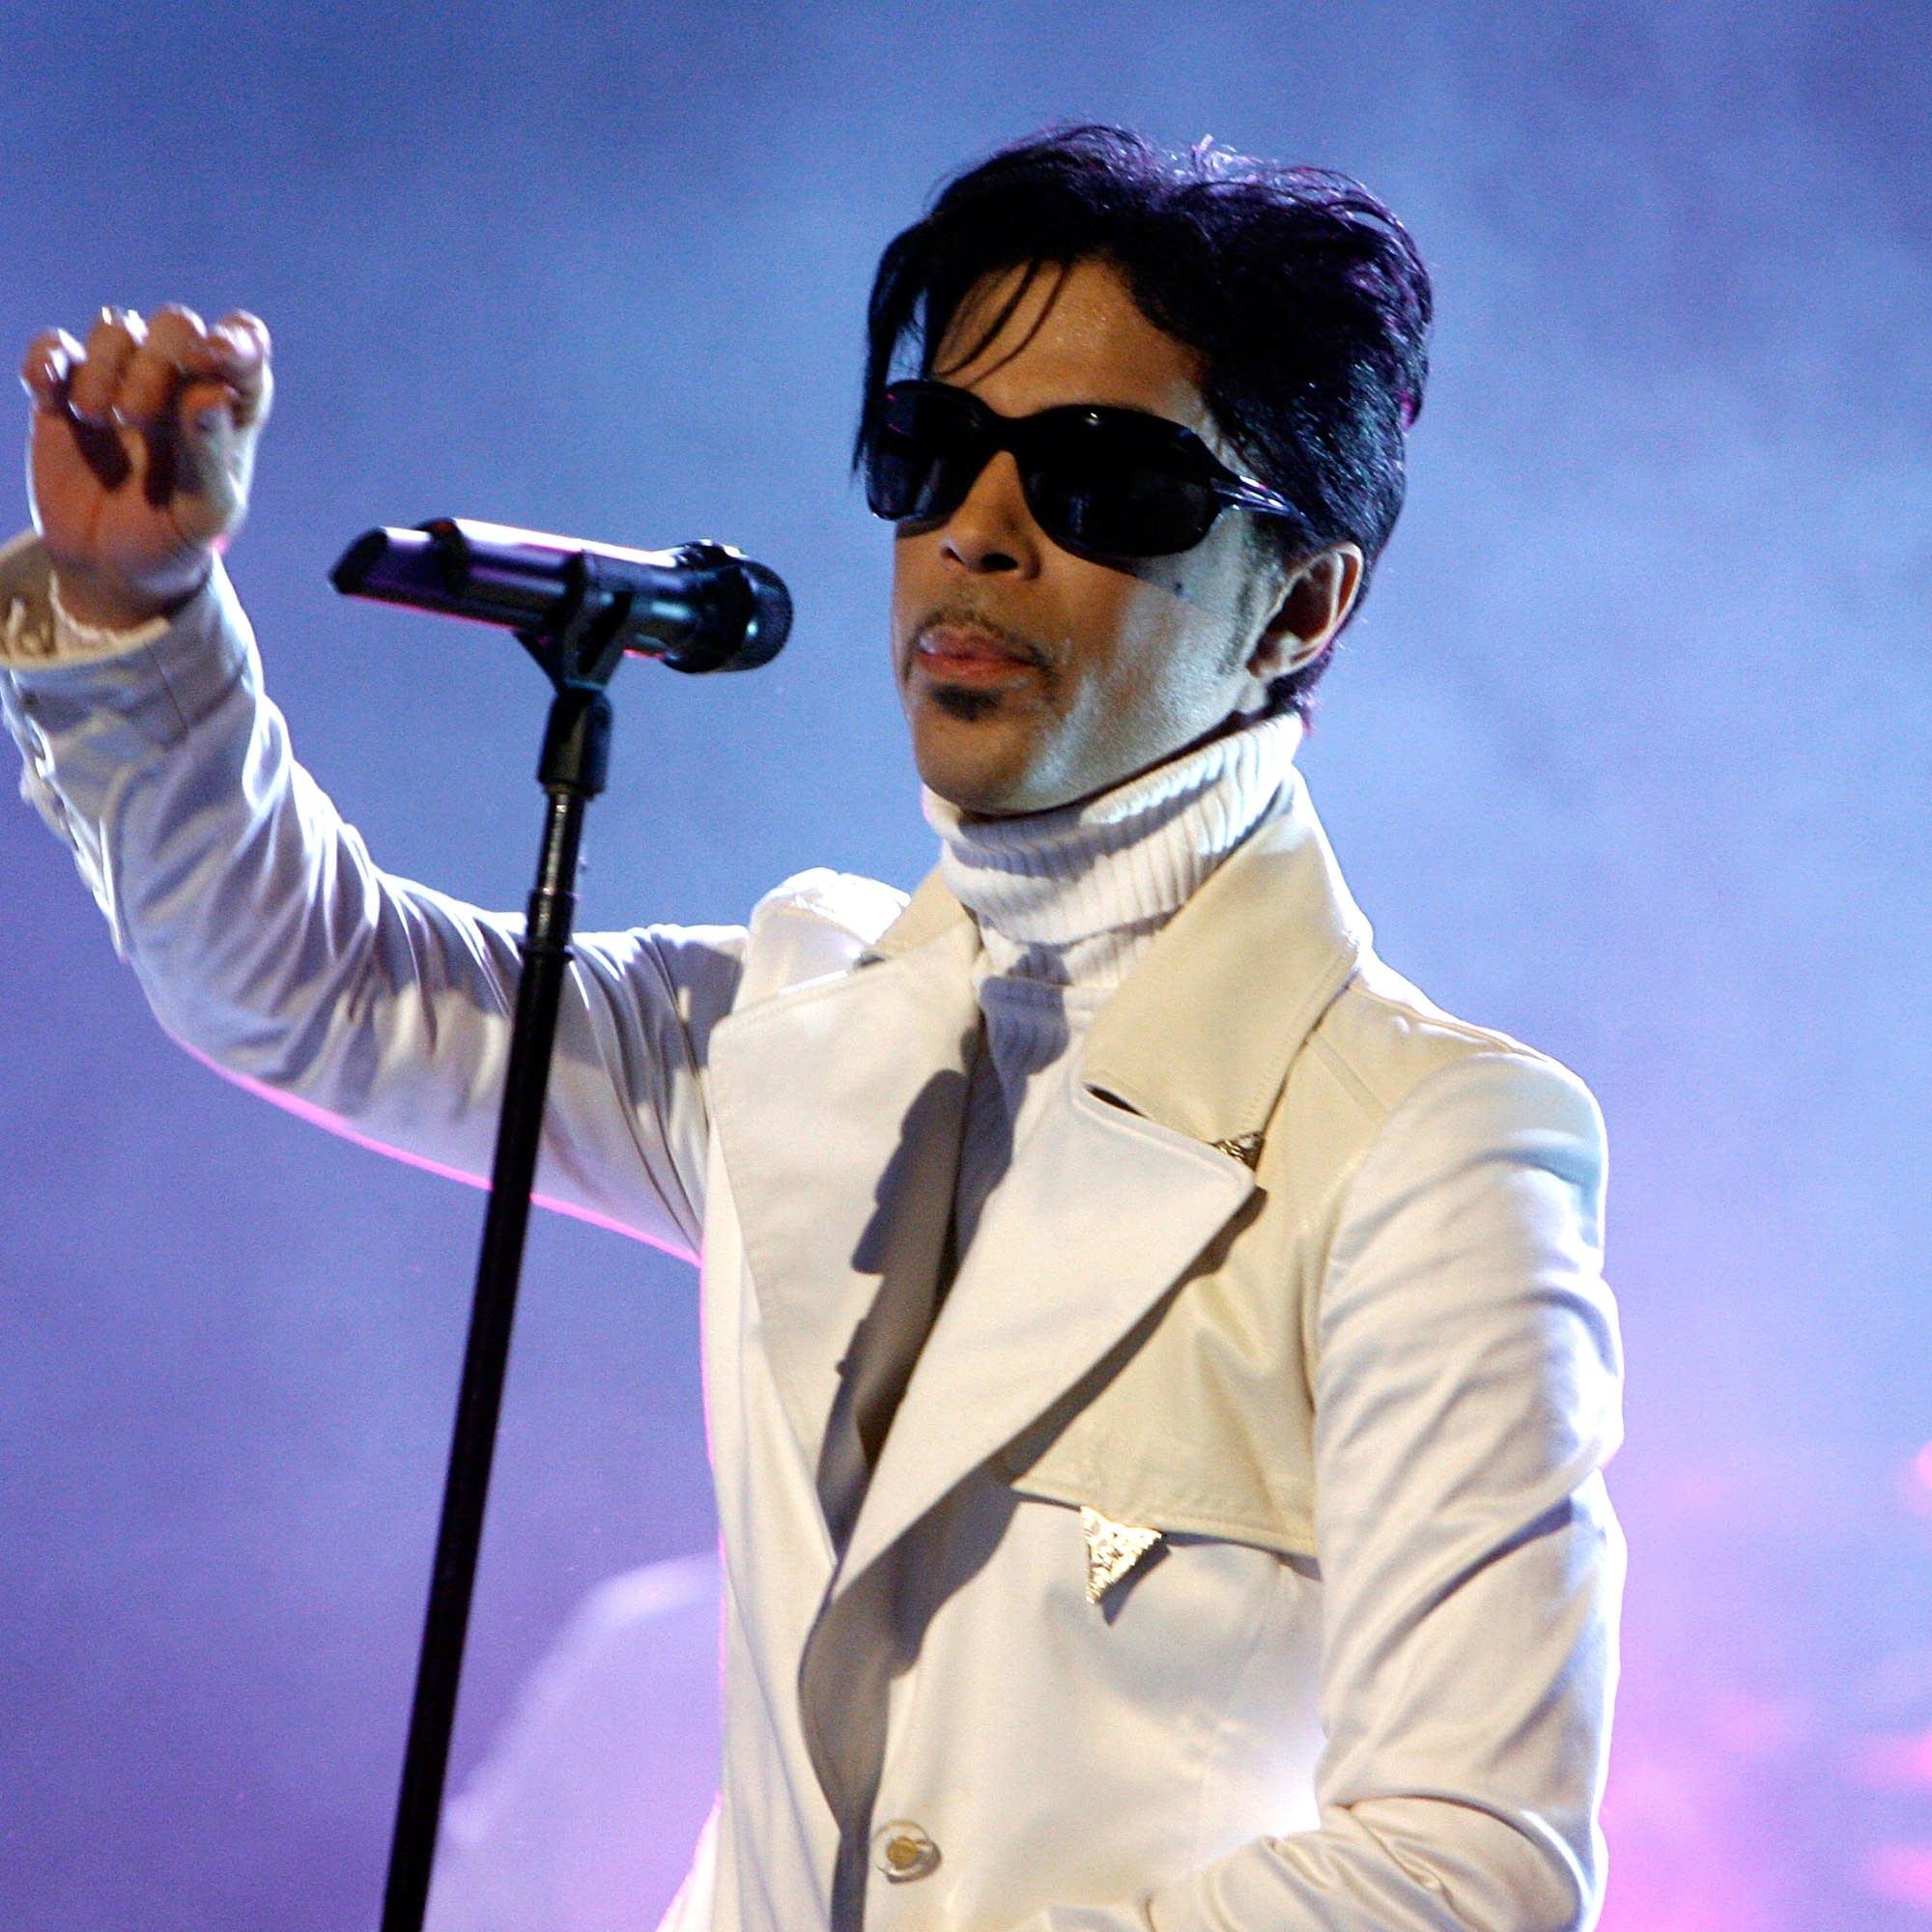 Prince onstage in Pasadena